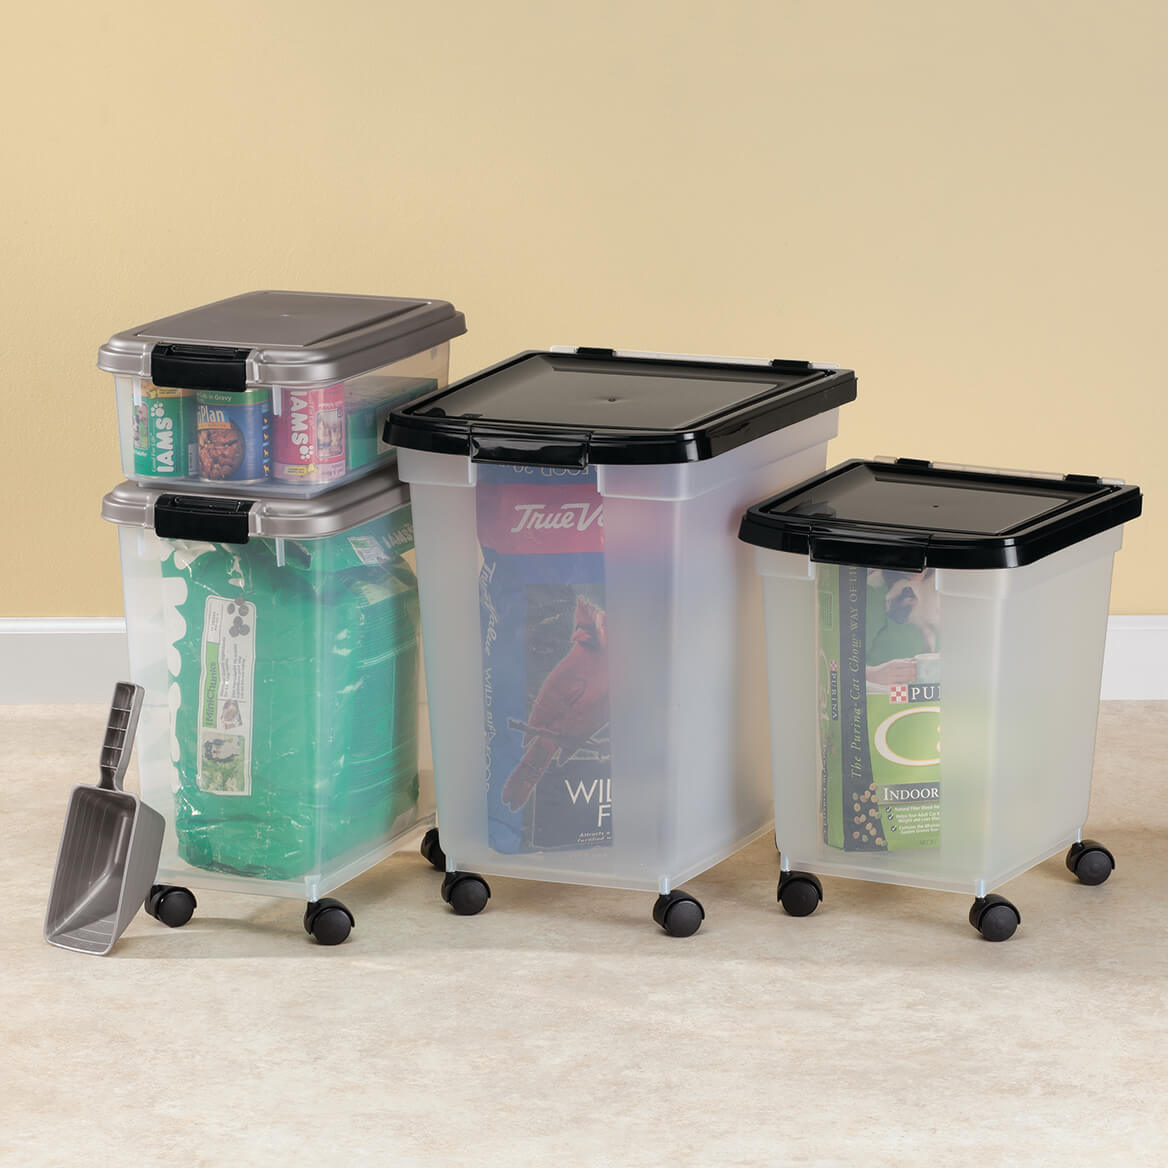 24.99 & Rolling Storage Bins - Rolling Plastic Storage Bins - Walter Drake